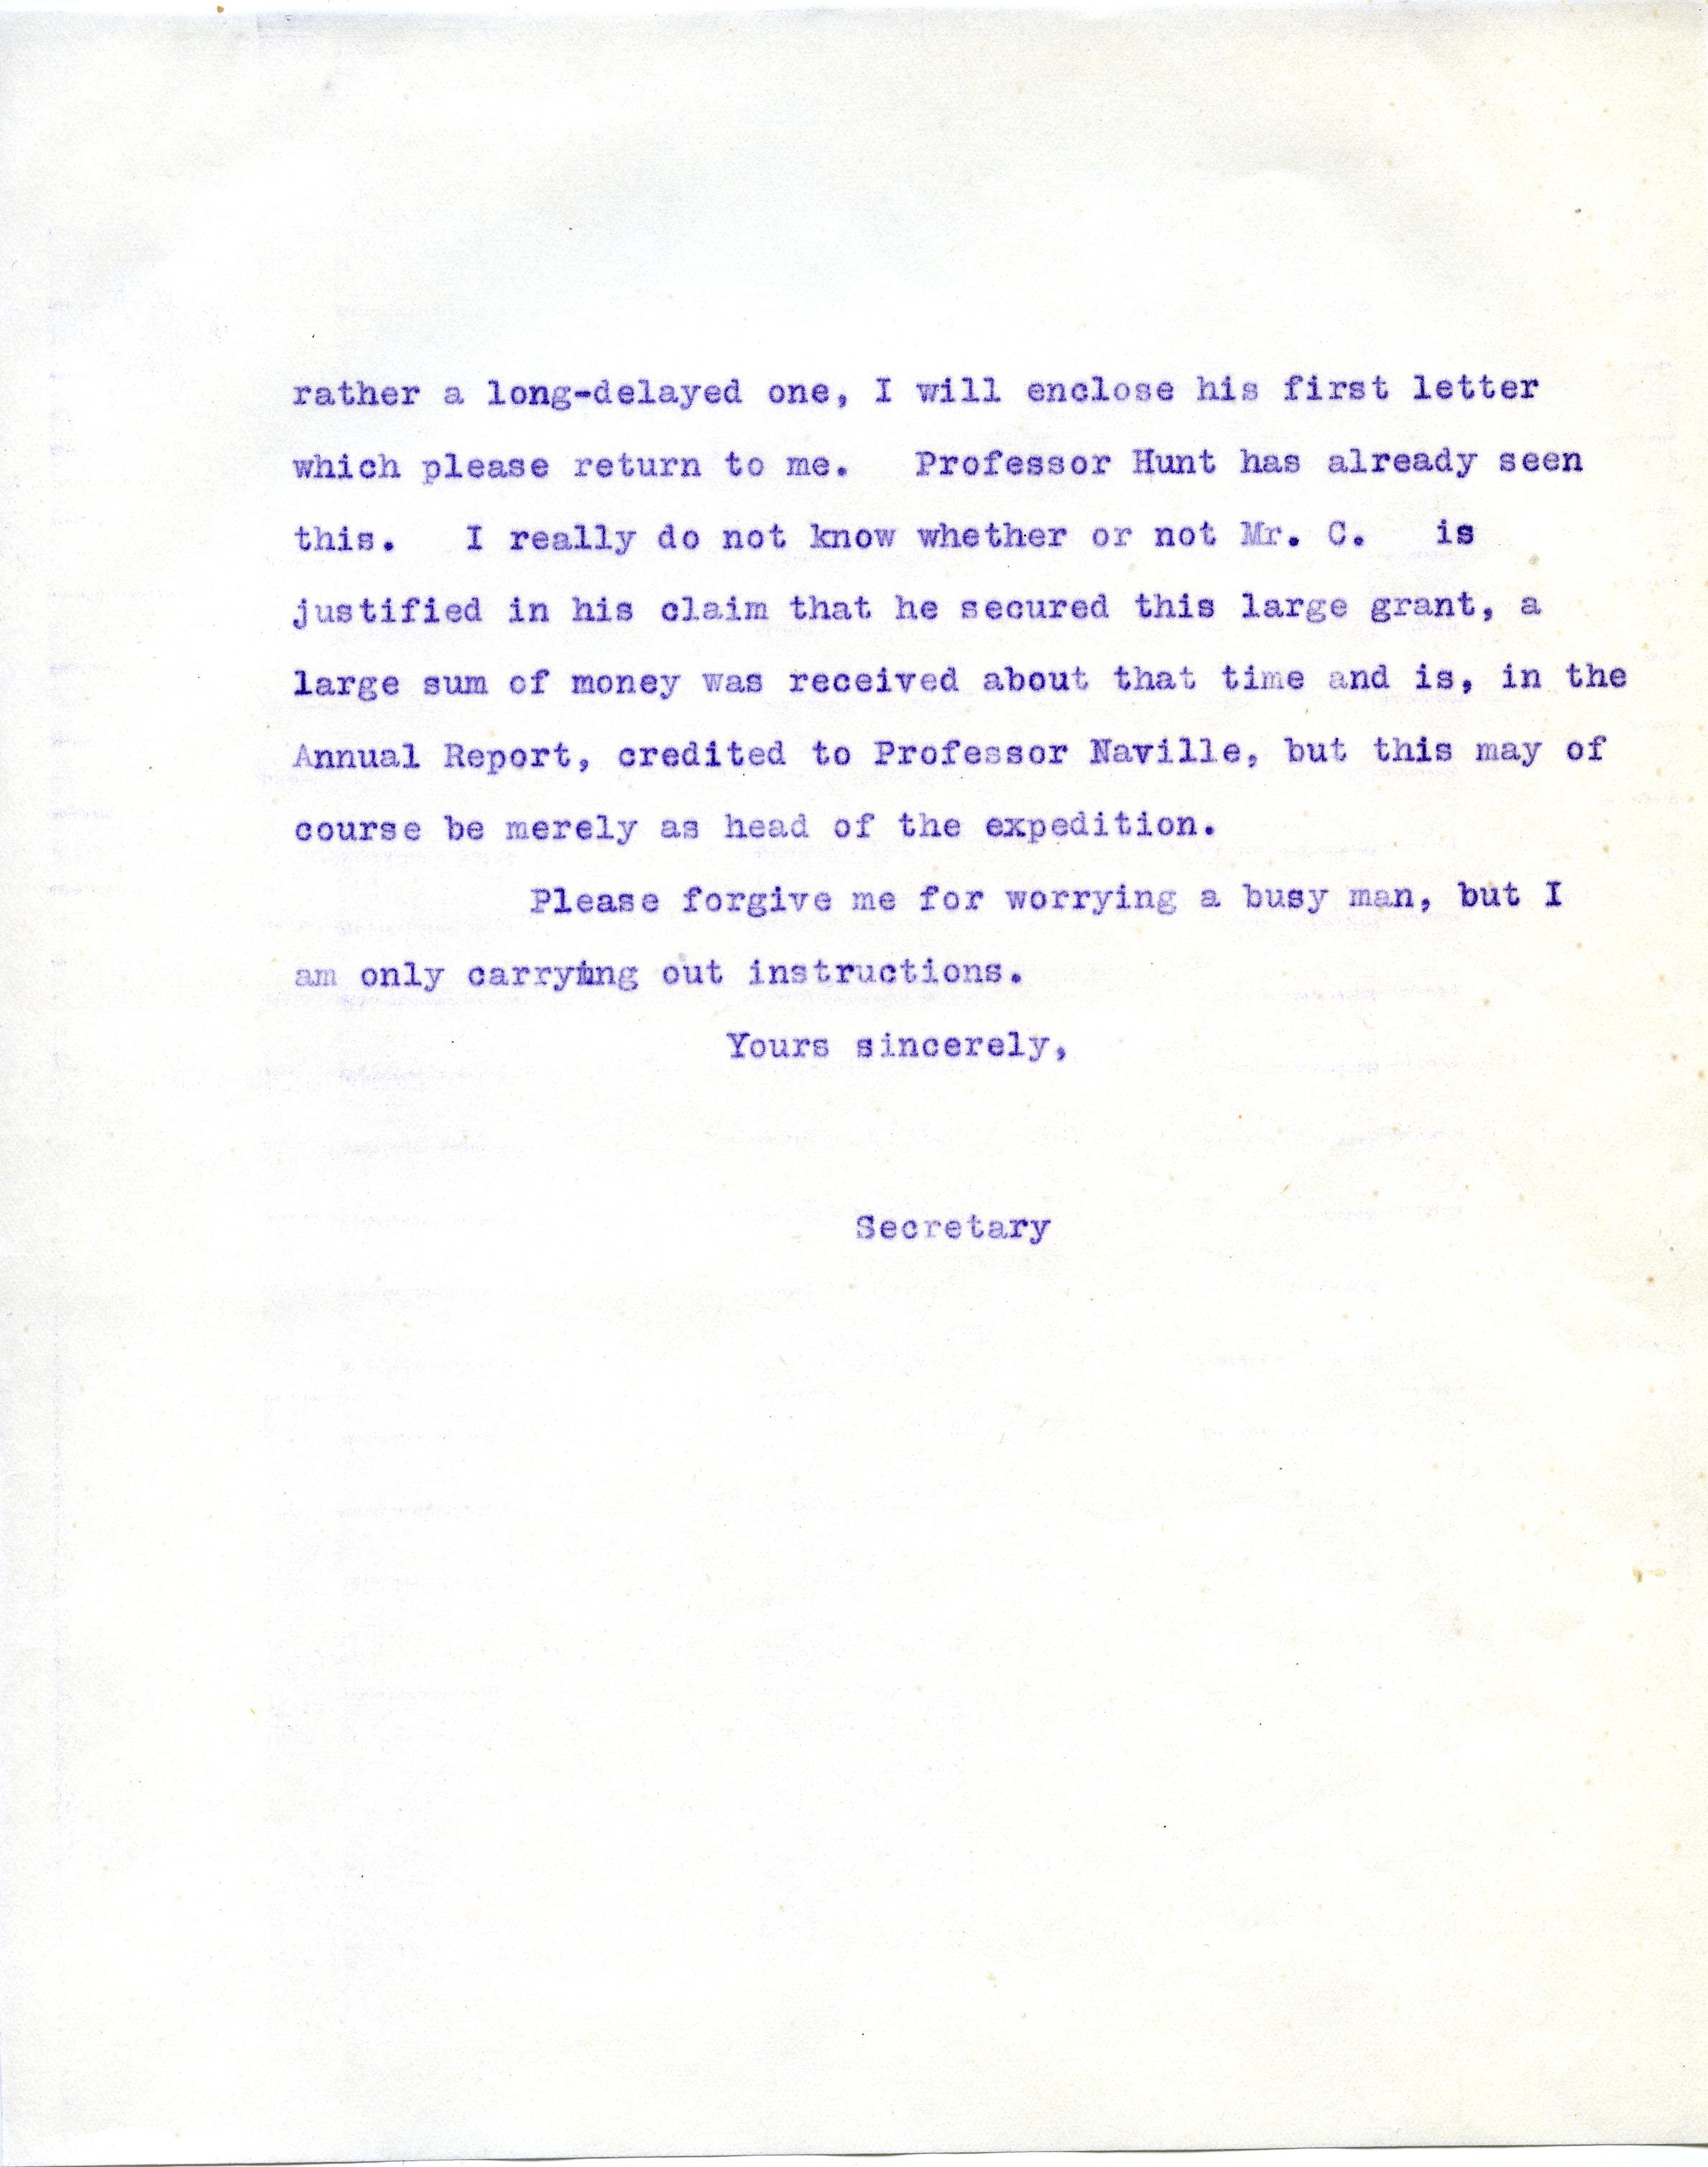 1904-05 Sinai, Deir el-Bahri, Oxyrhynchus, Naukratis DIST.23.40b